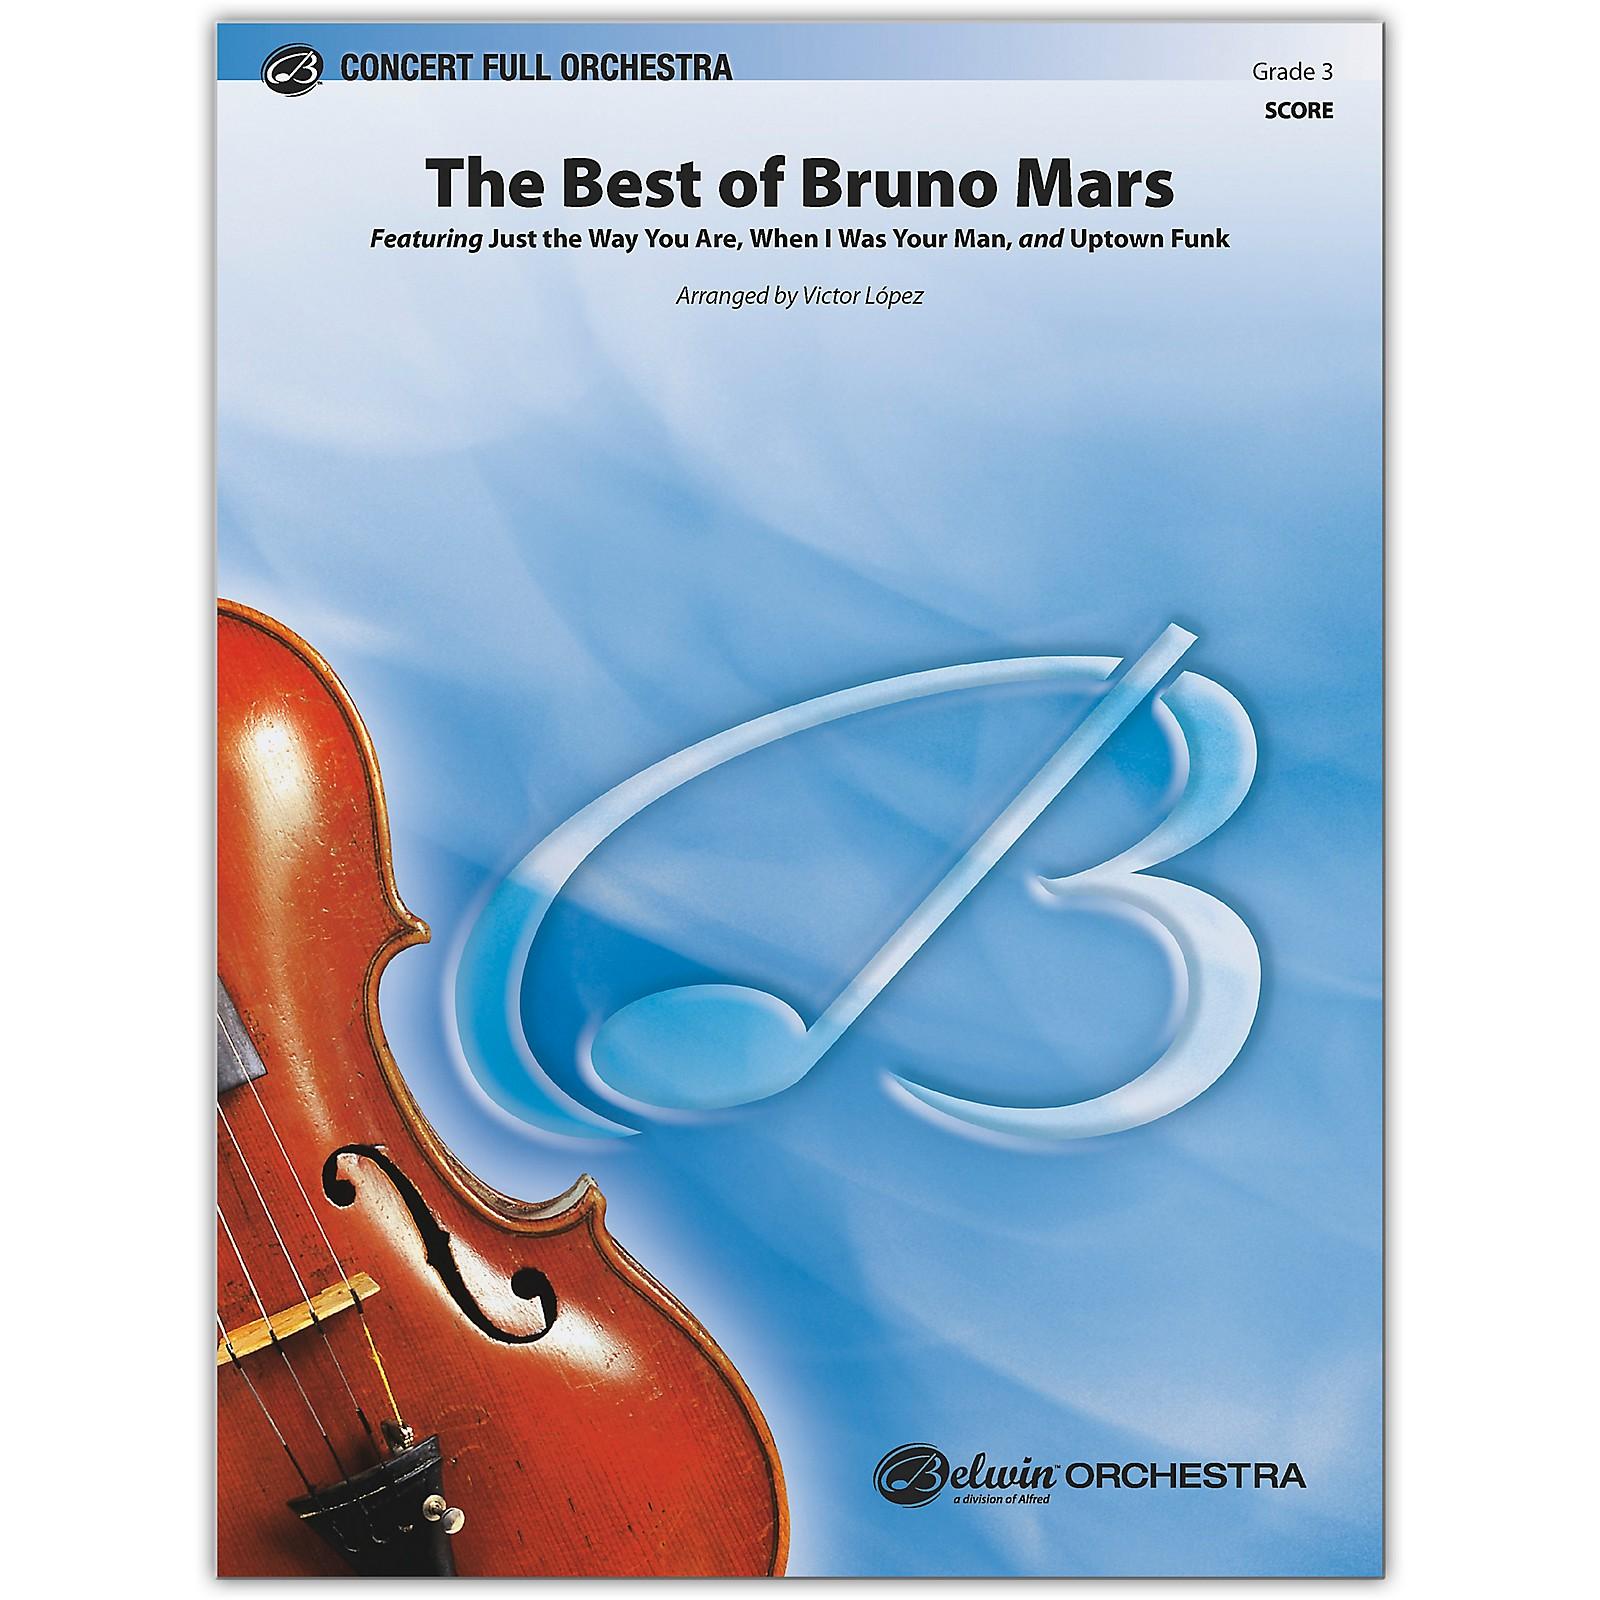 BELWIN The Best of Bruno Mars Conductor Score 3